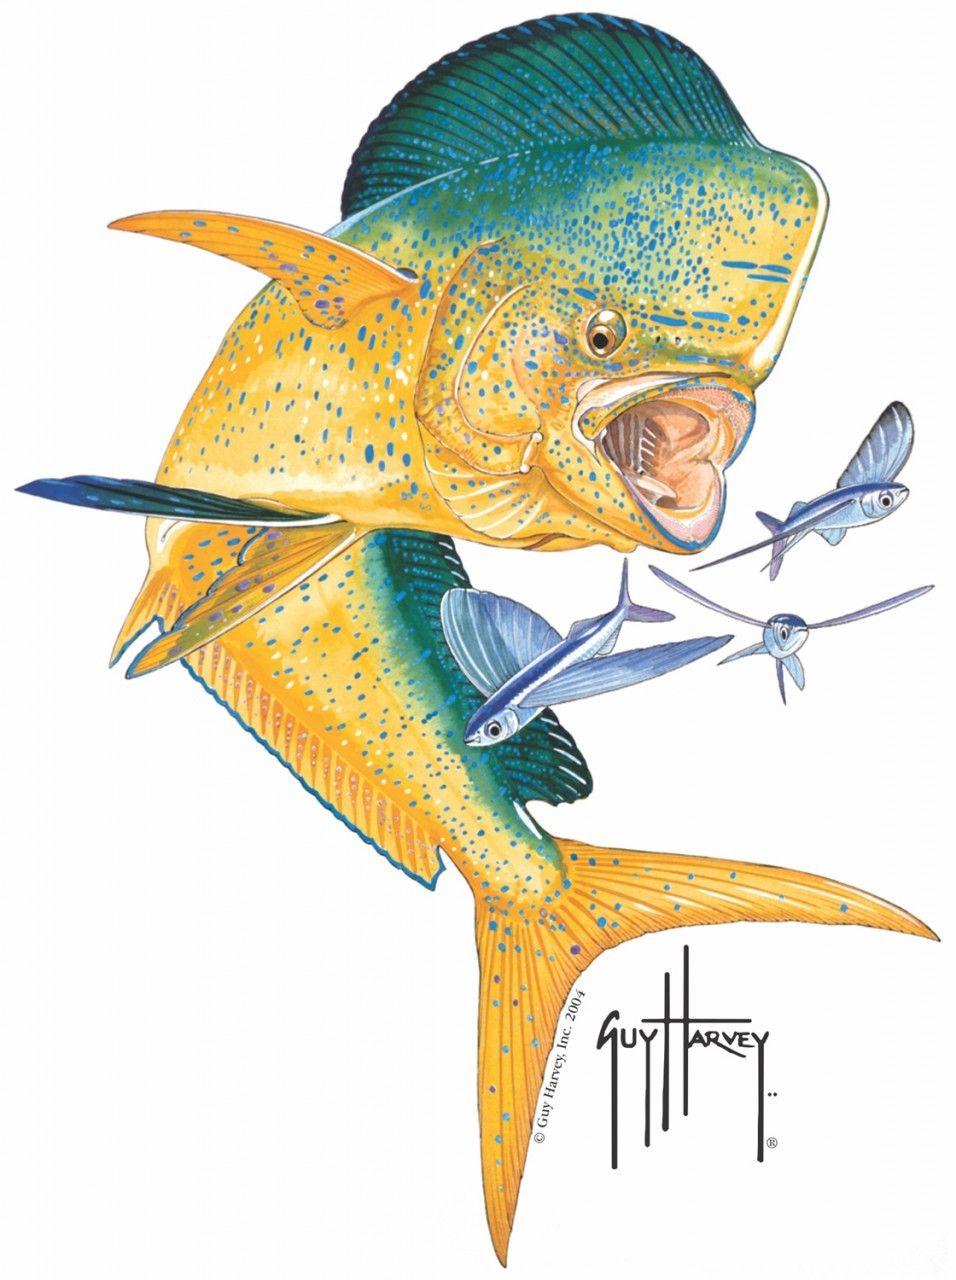 Guy harvey fish